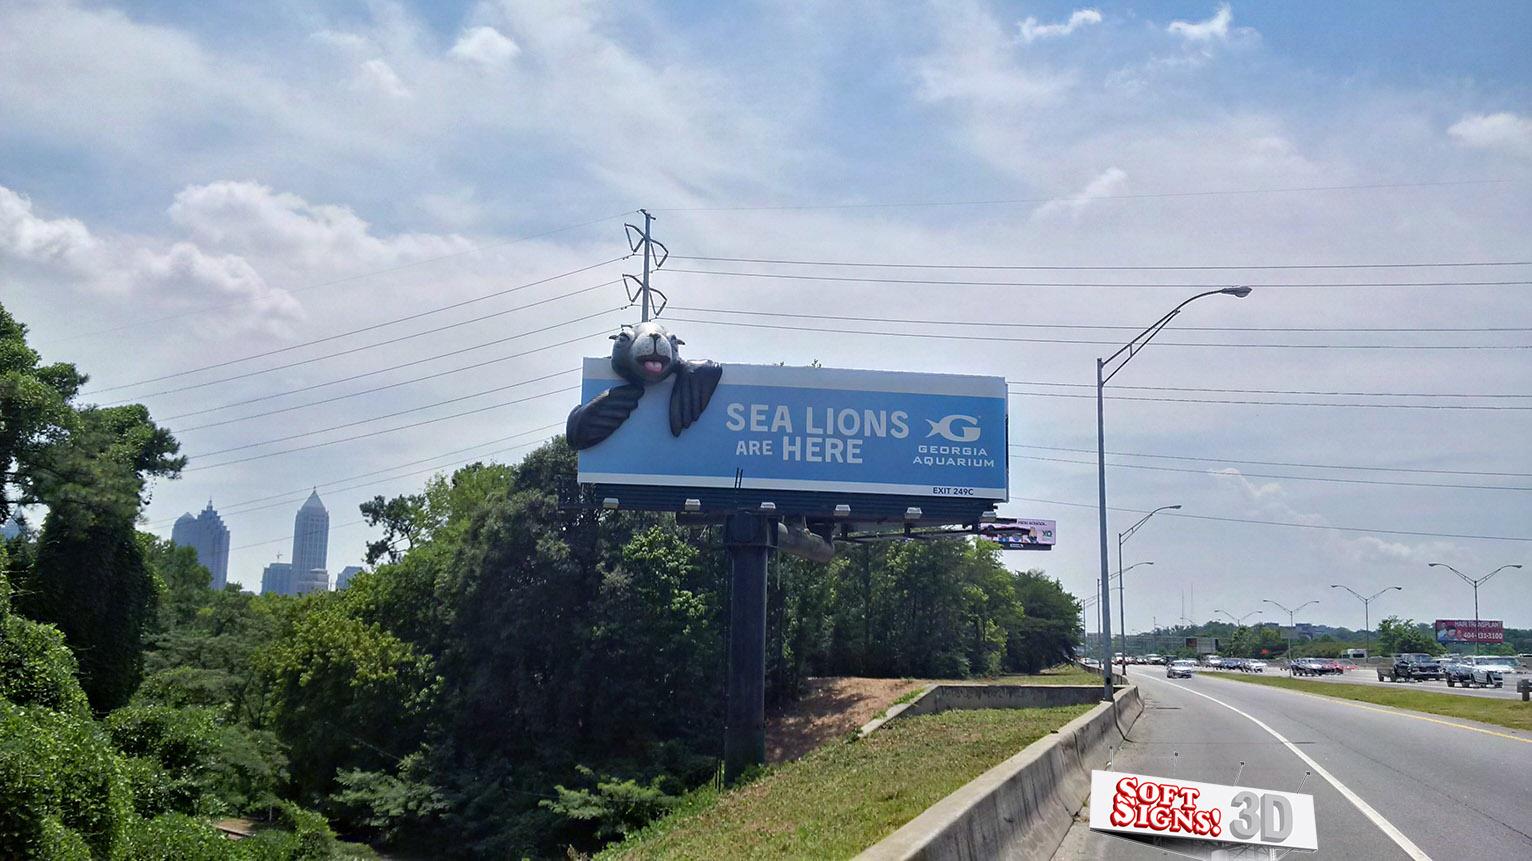 Georgia Aquarium Sea Lion 3D By Soft Signs 3D